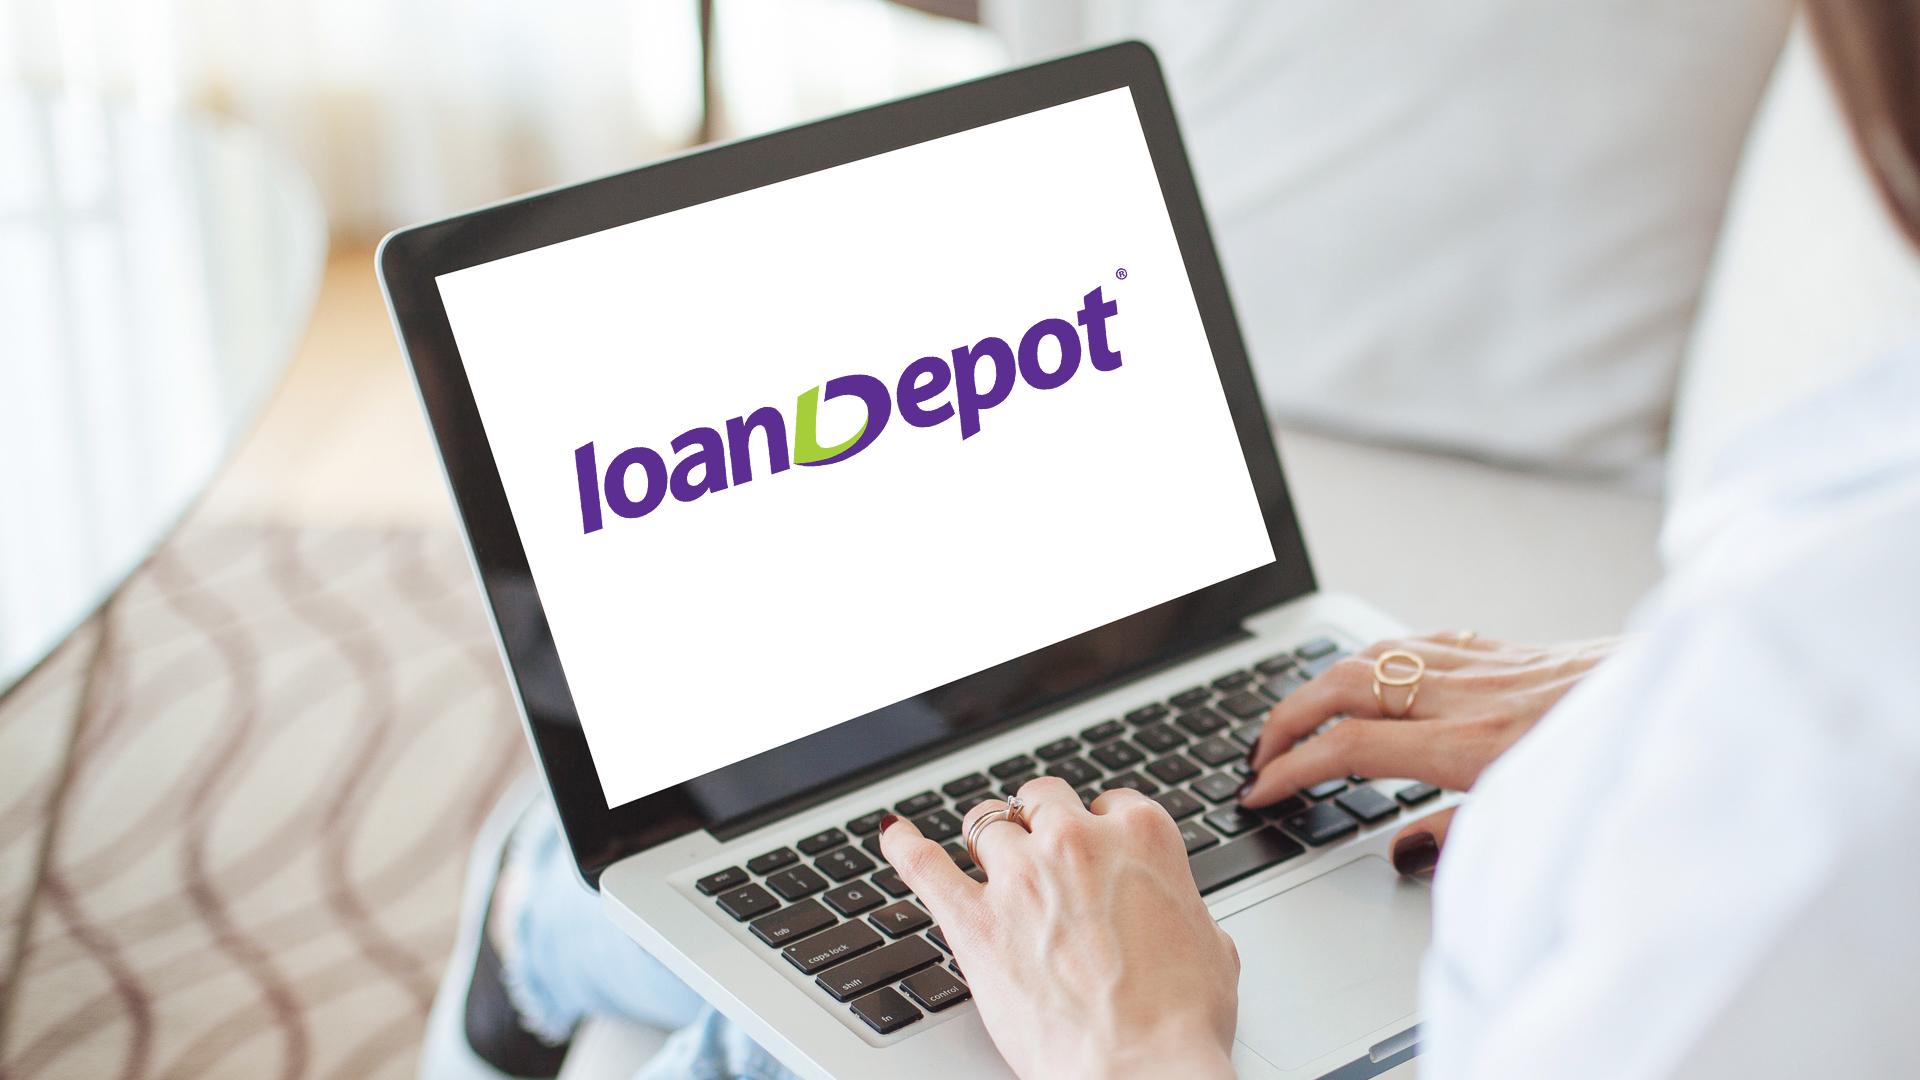 Consolidating credit card debt into loan depot